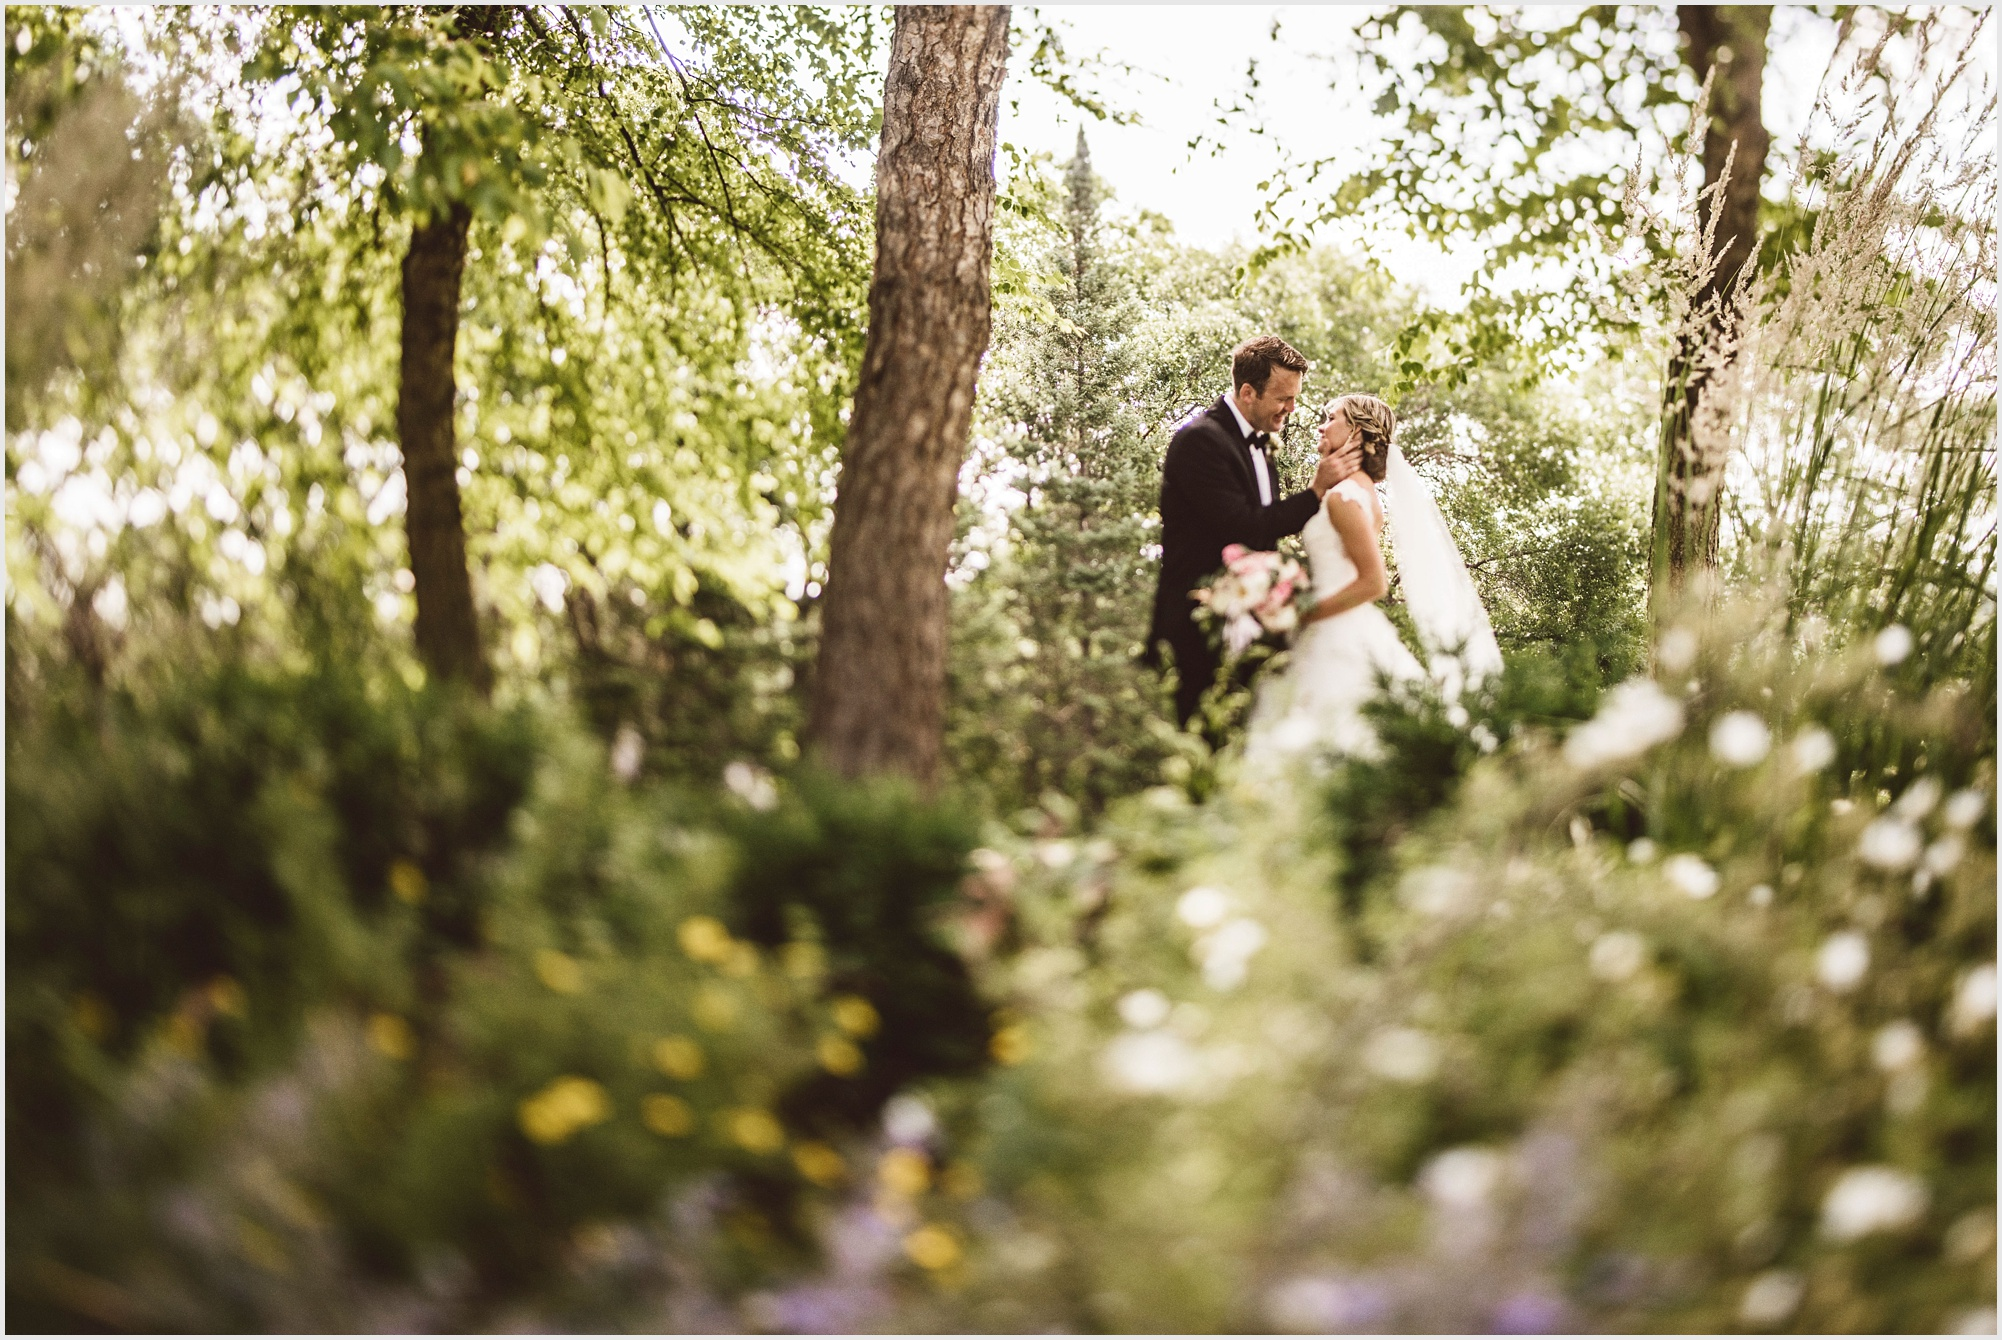 maura_david_james_j_hill_wedding_lucas_botz_photography_027.jpg